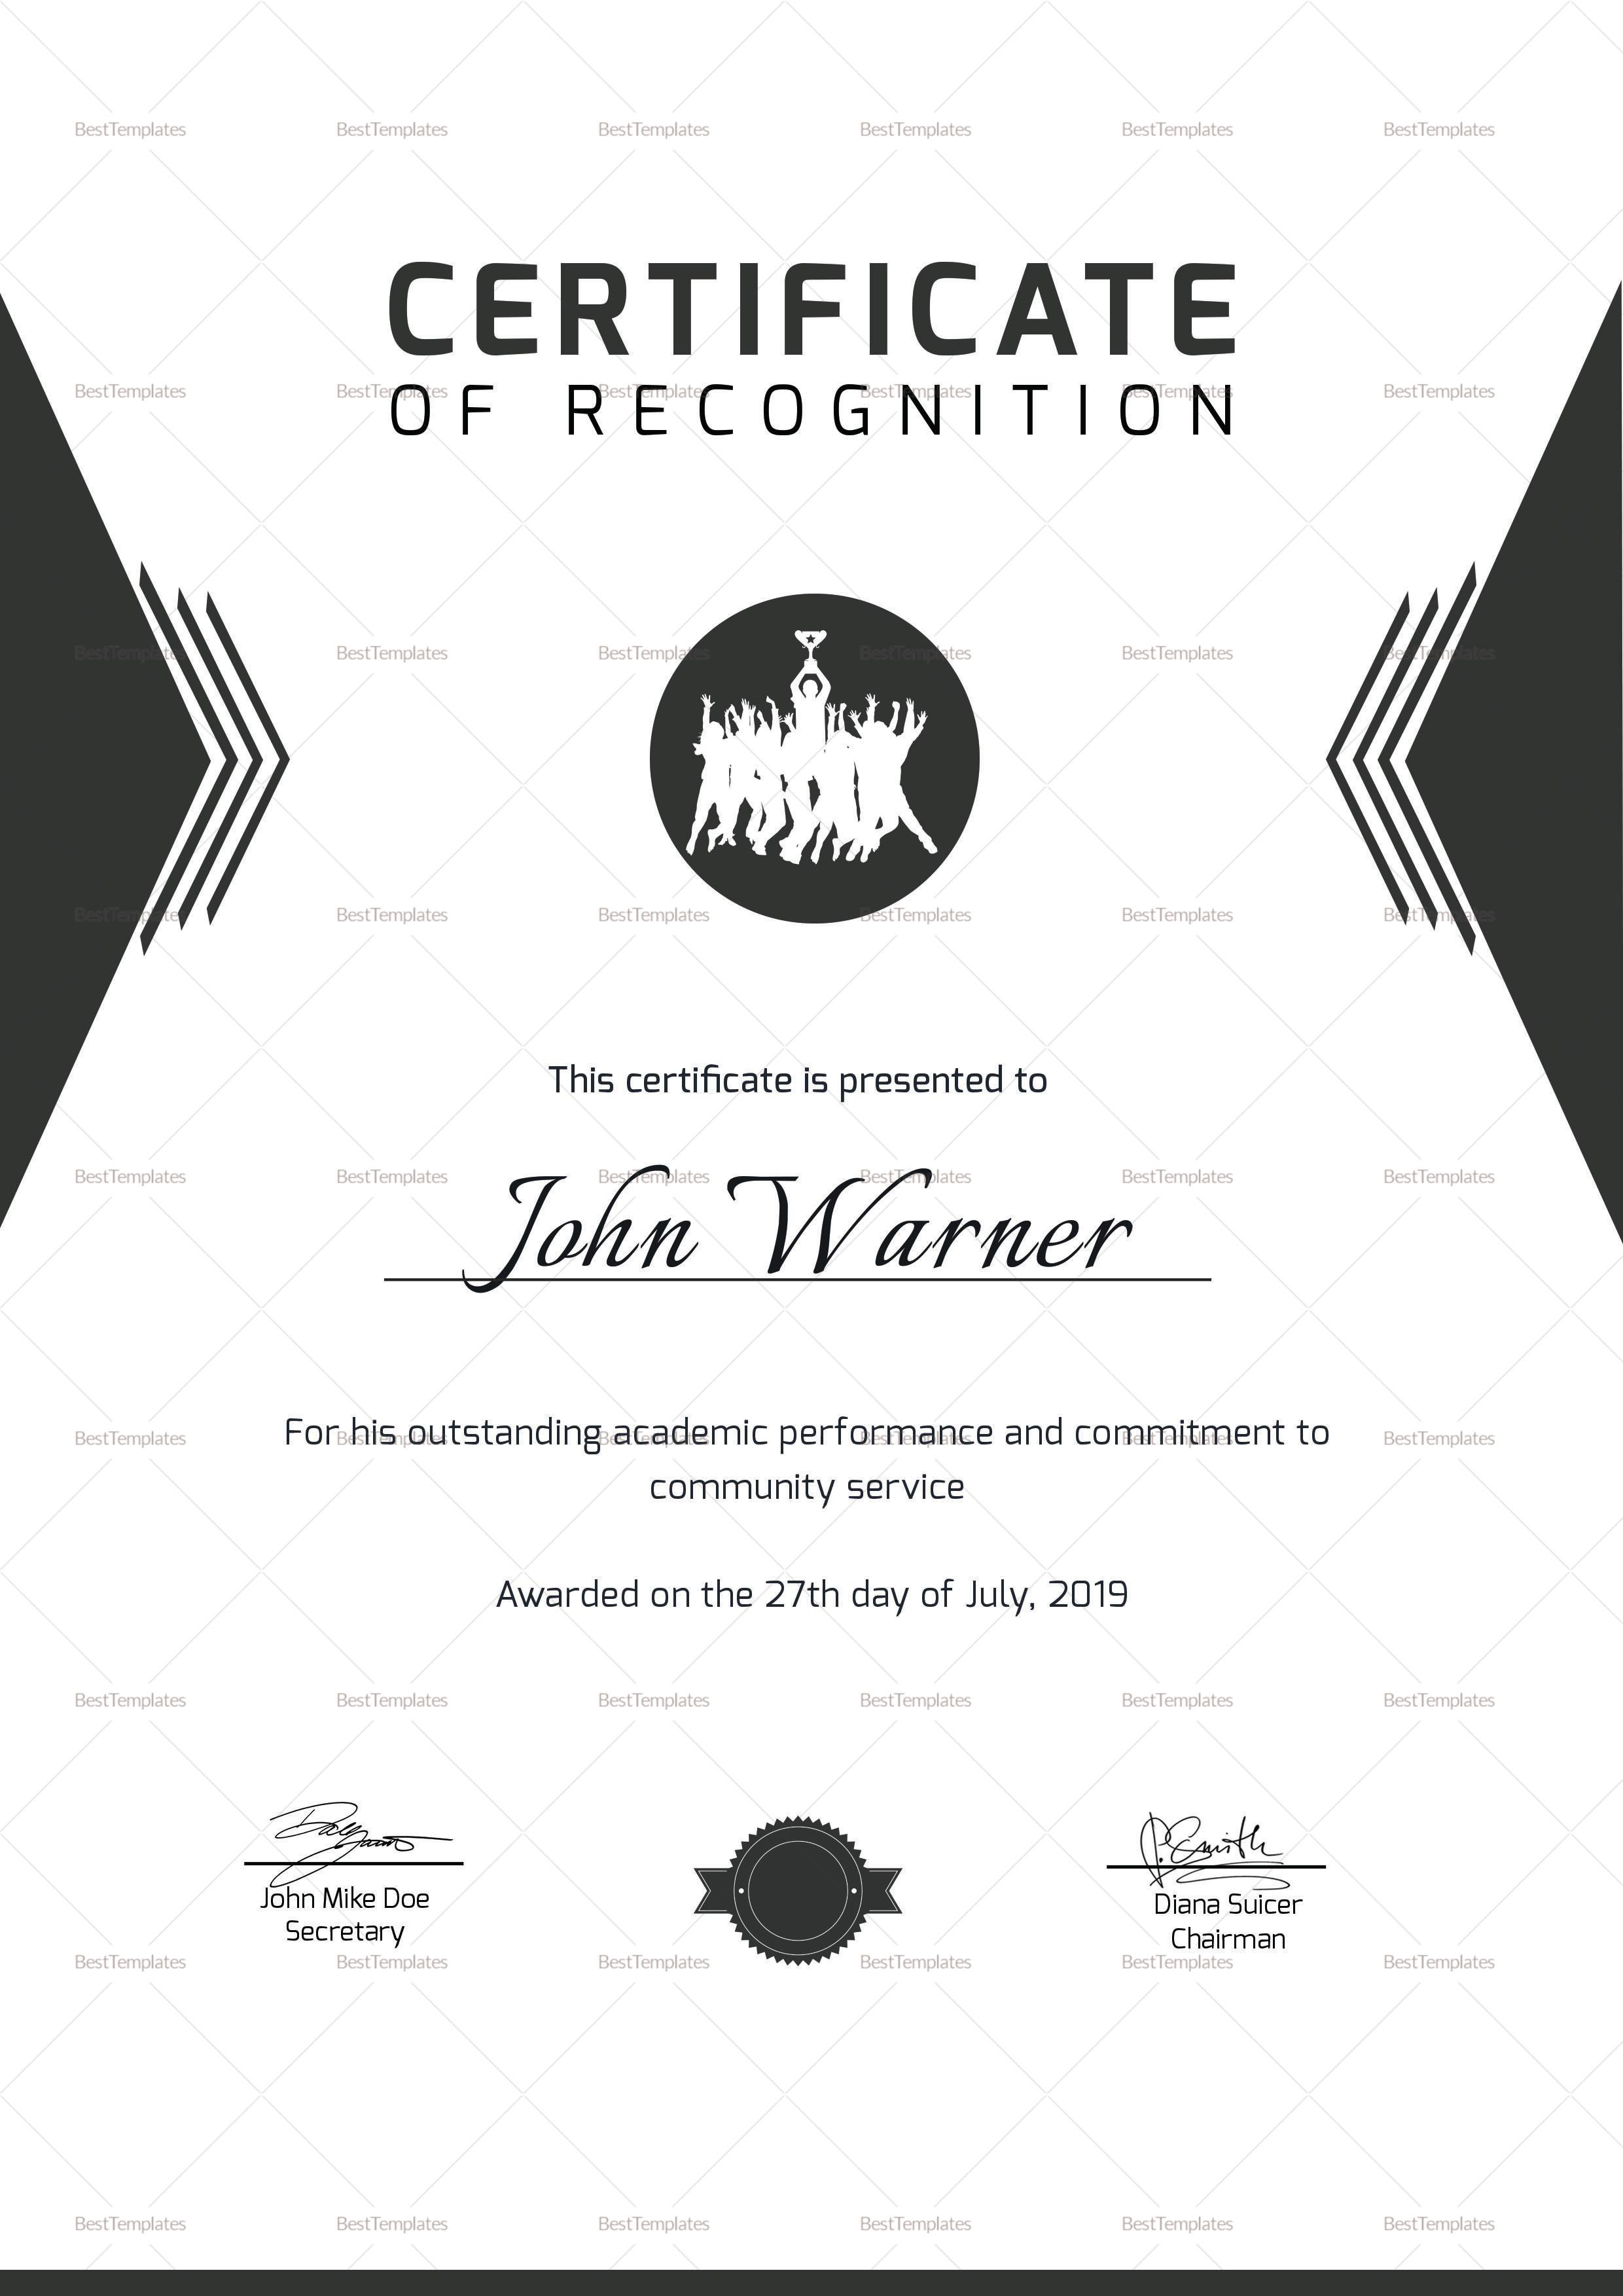 prize winning certificate design template in psd word